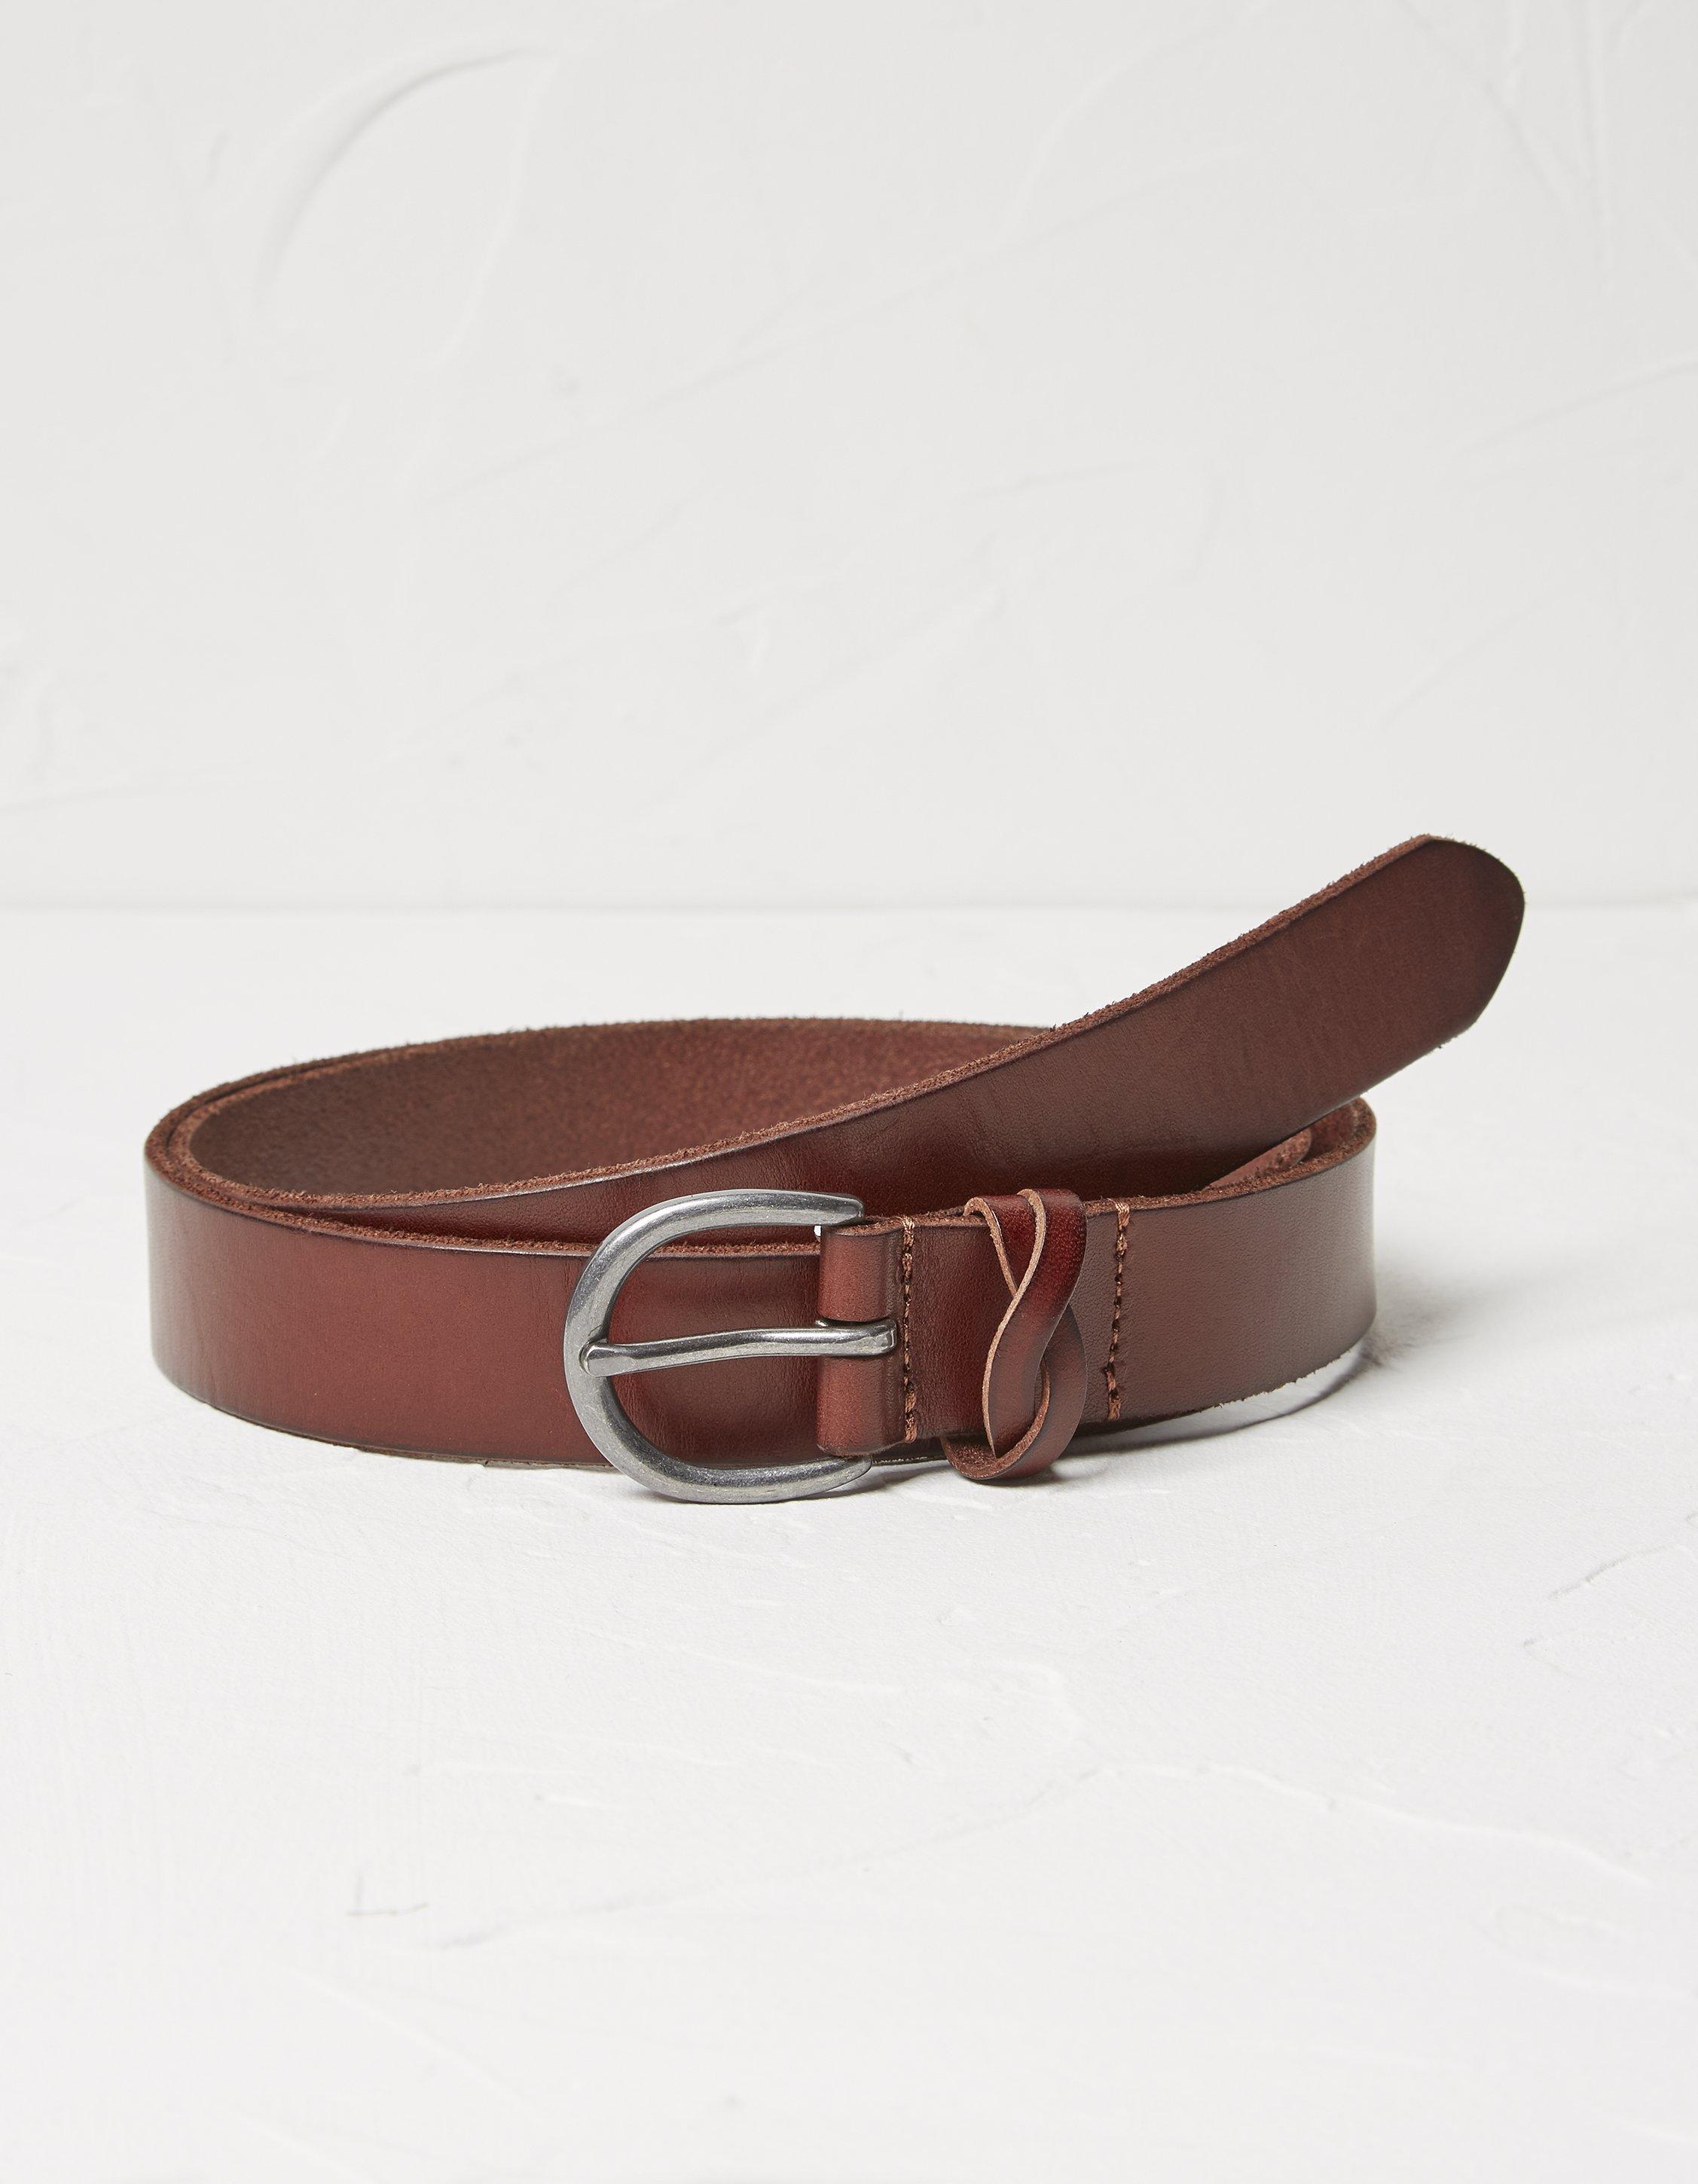 Fat Face Plait Keeper Leather Belt  - Size: Medium